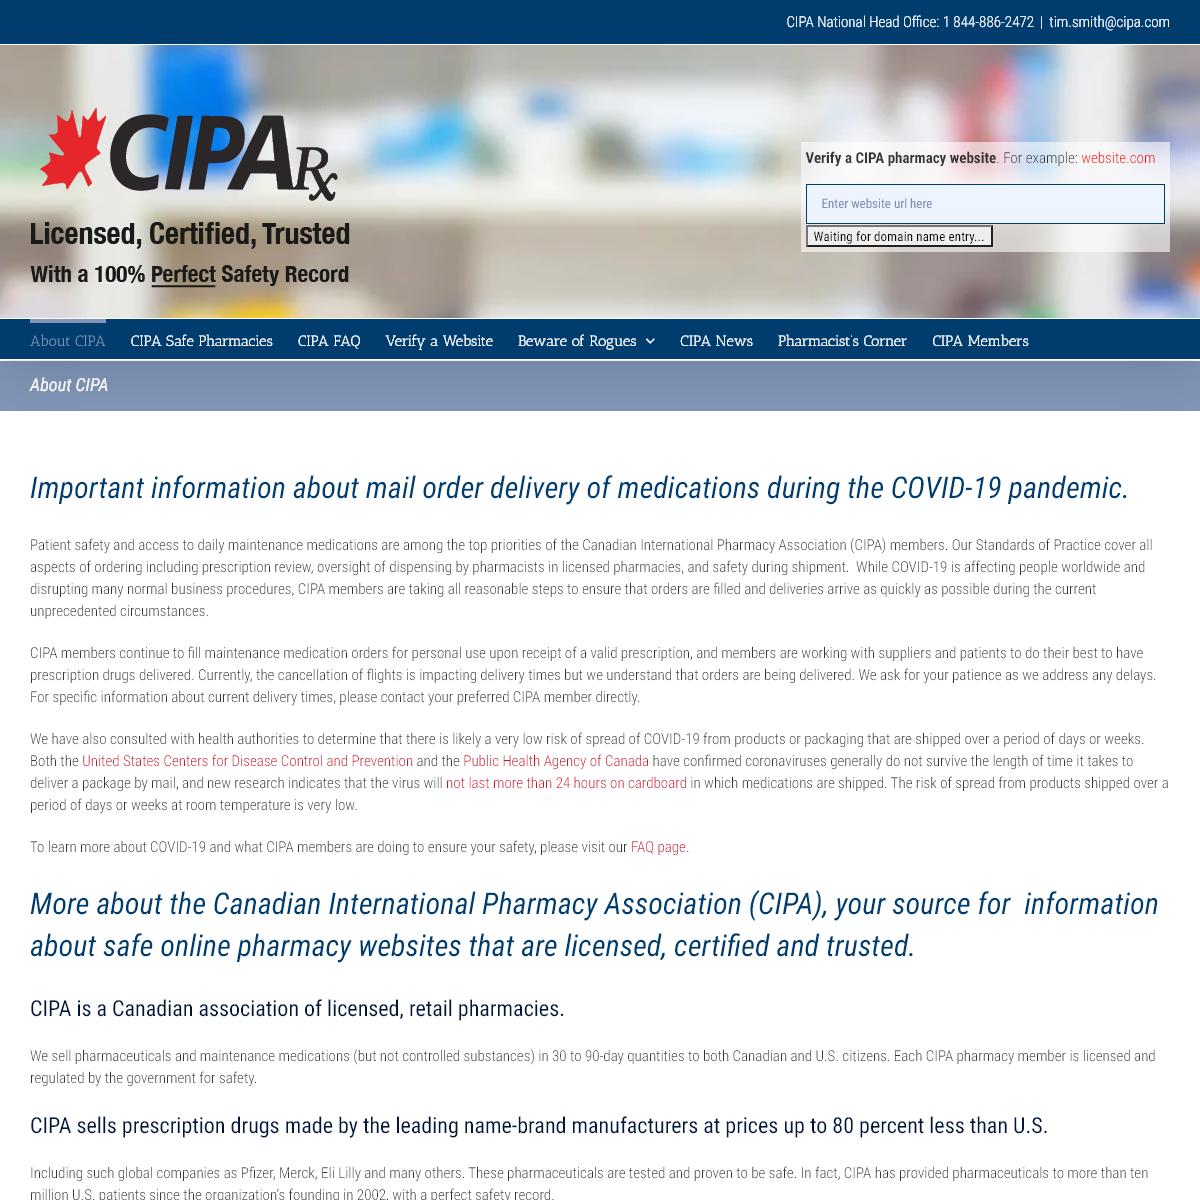 Canadian International Pharmacy Association – Verifying Safe Online Pharmacies Since 2002 – CIPA is a online pharmacy verifi